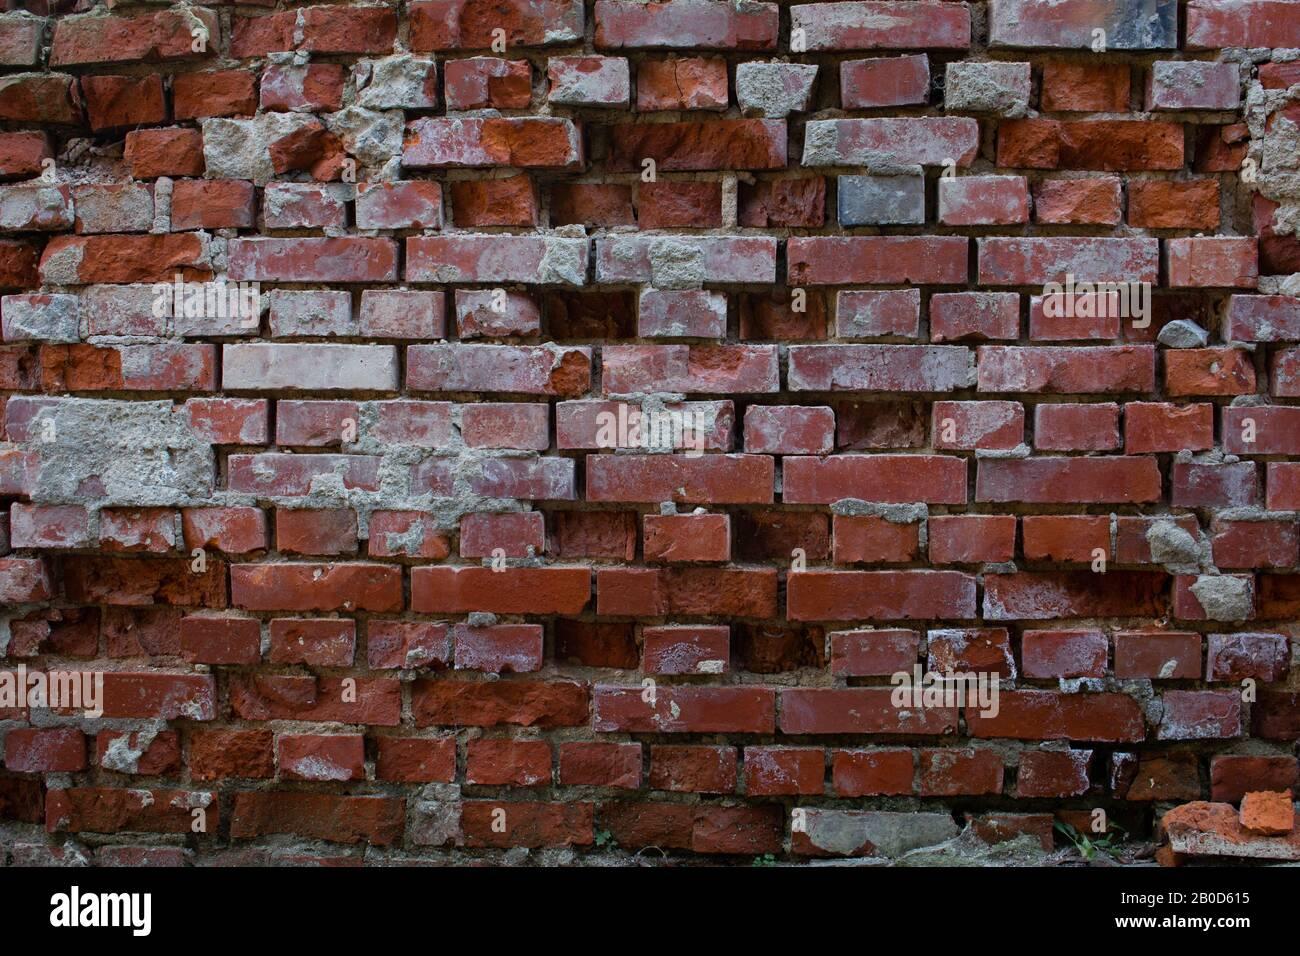 Old Broken Damaged And Corroded Brick Wall With Broken Bricks